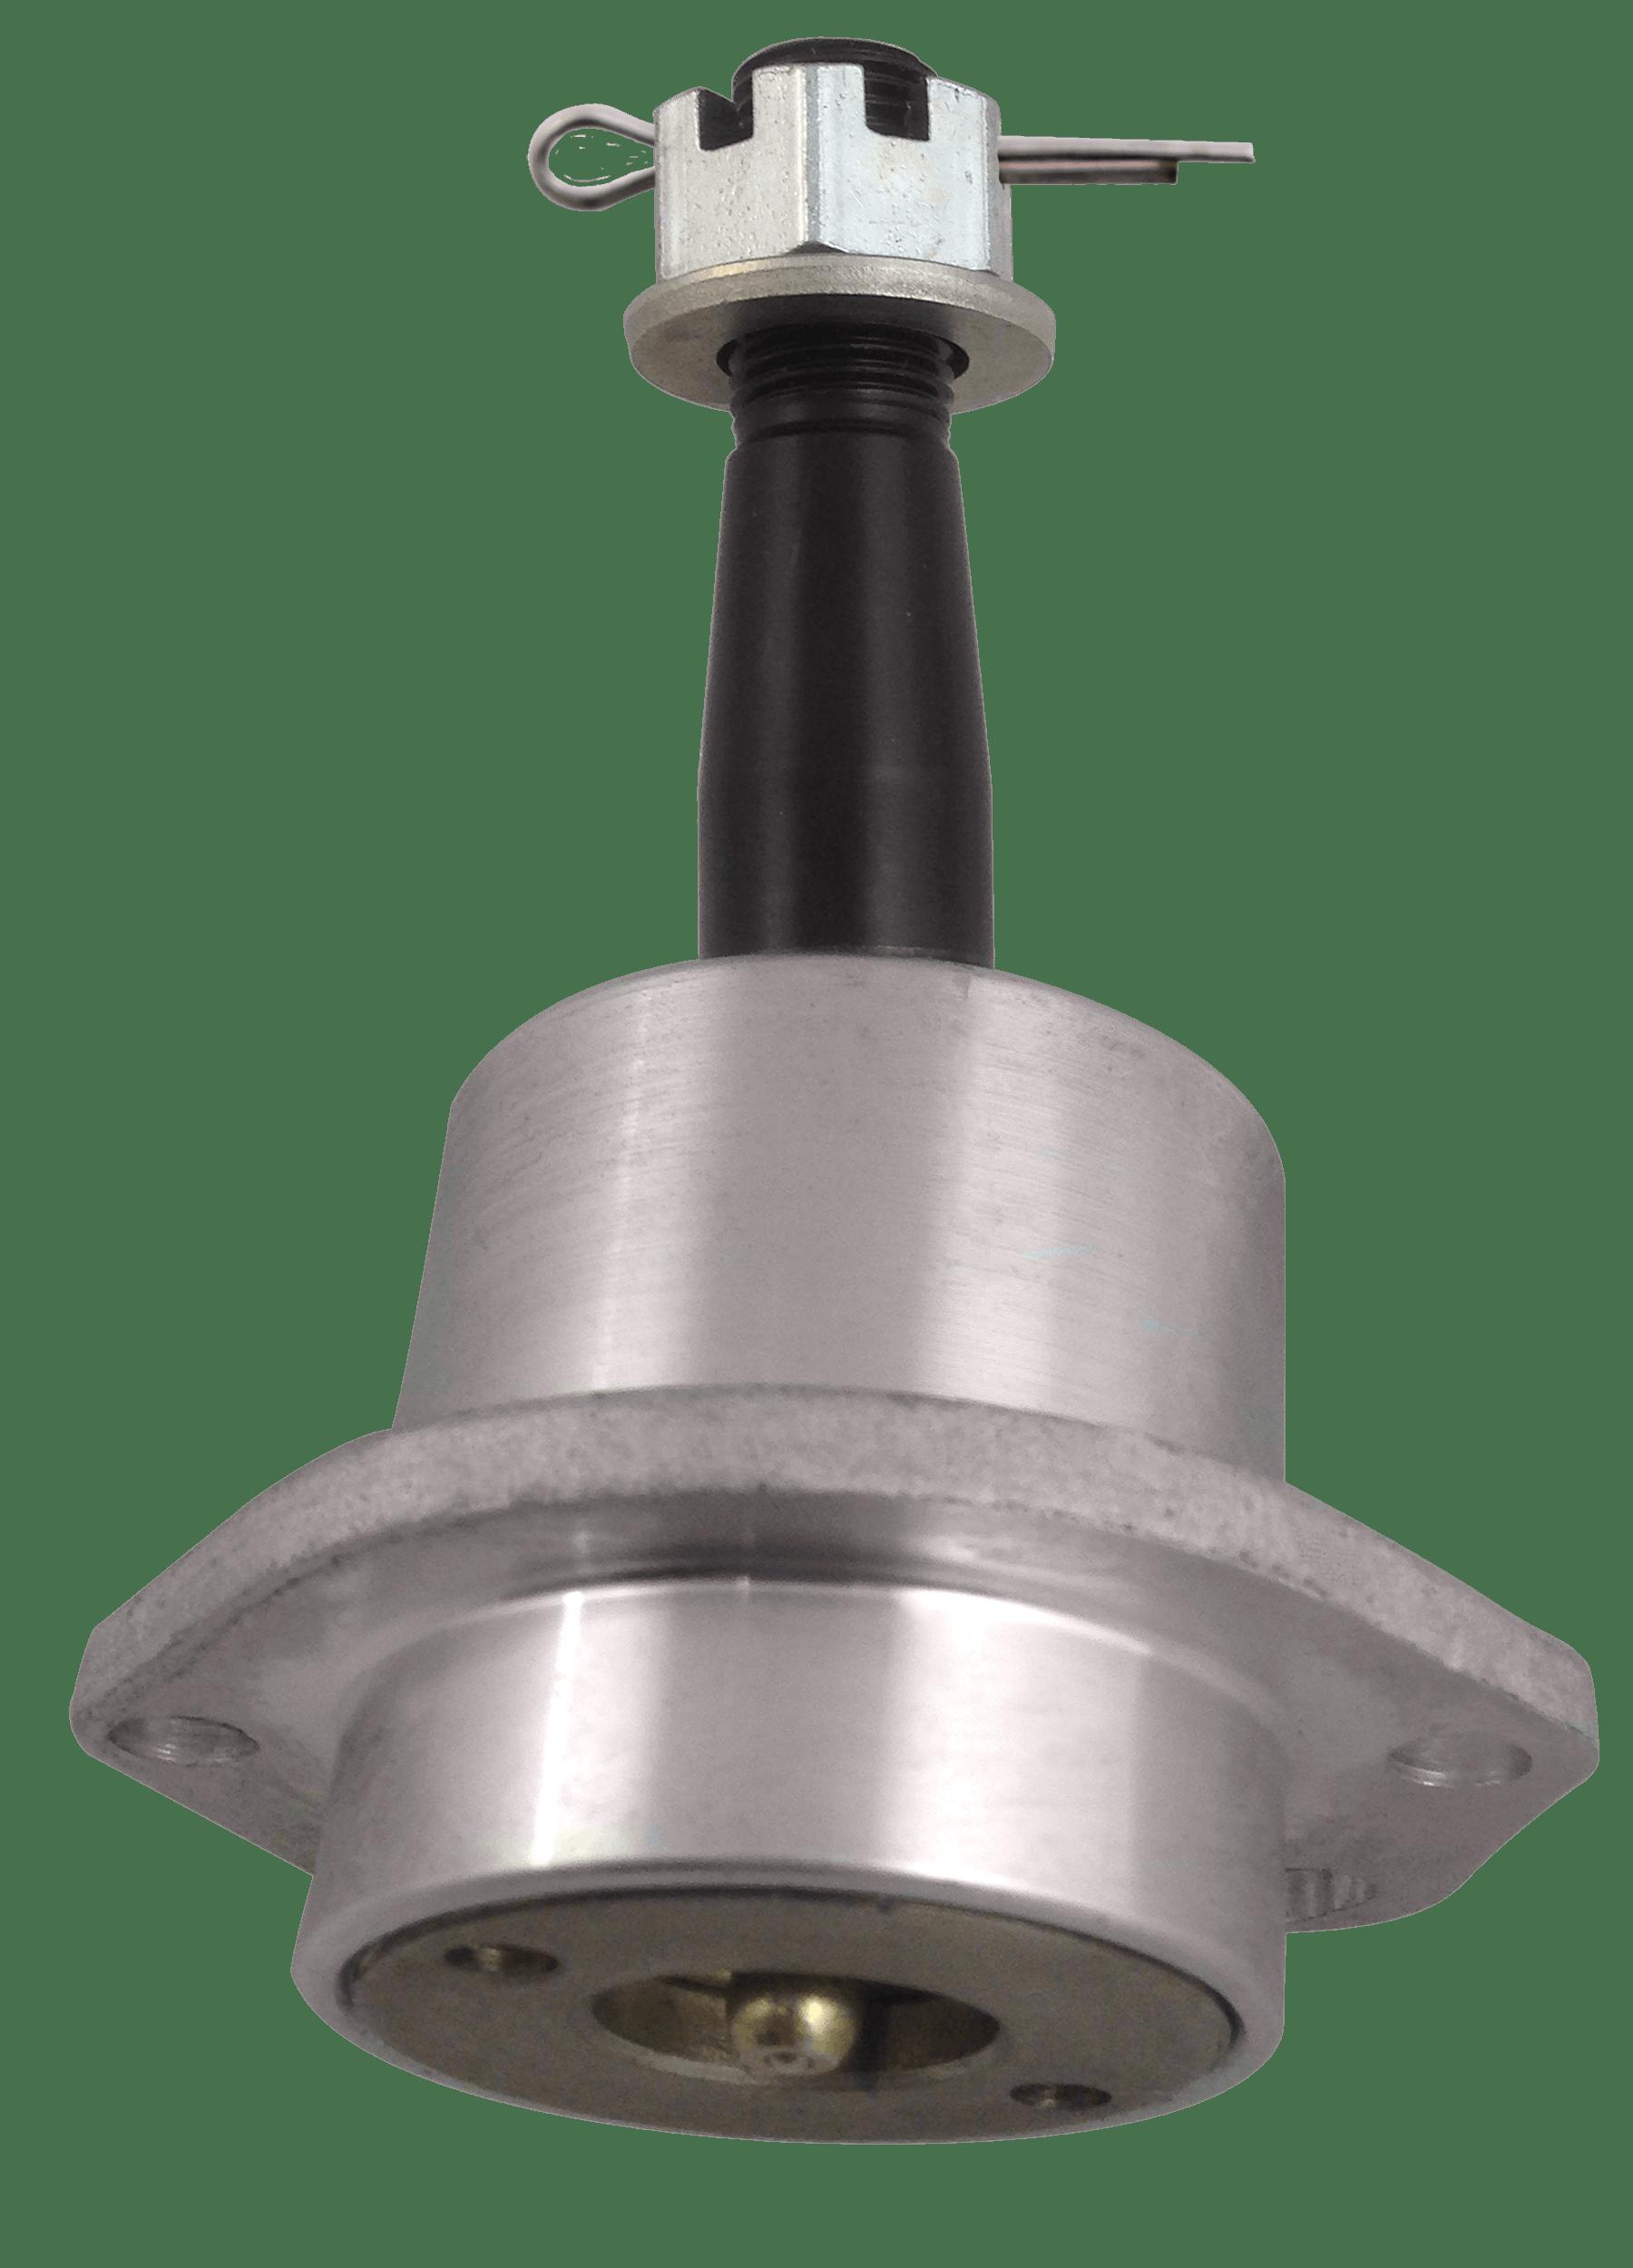 QA1 9029-226 Ball-Joint Stud